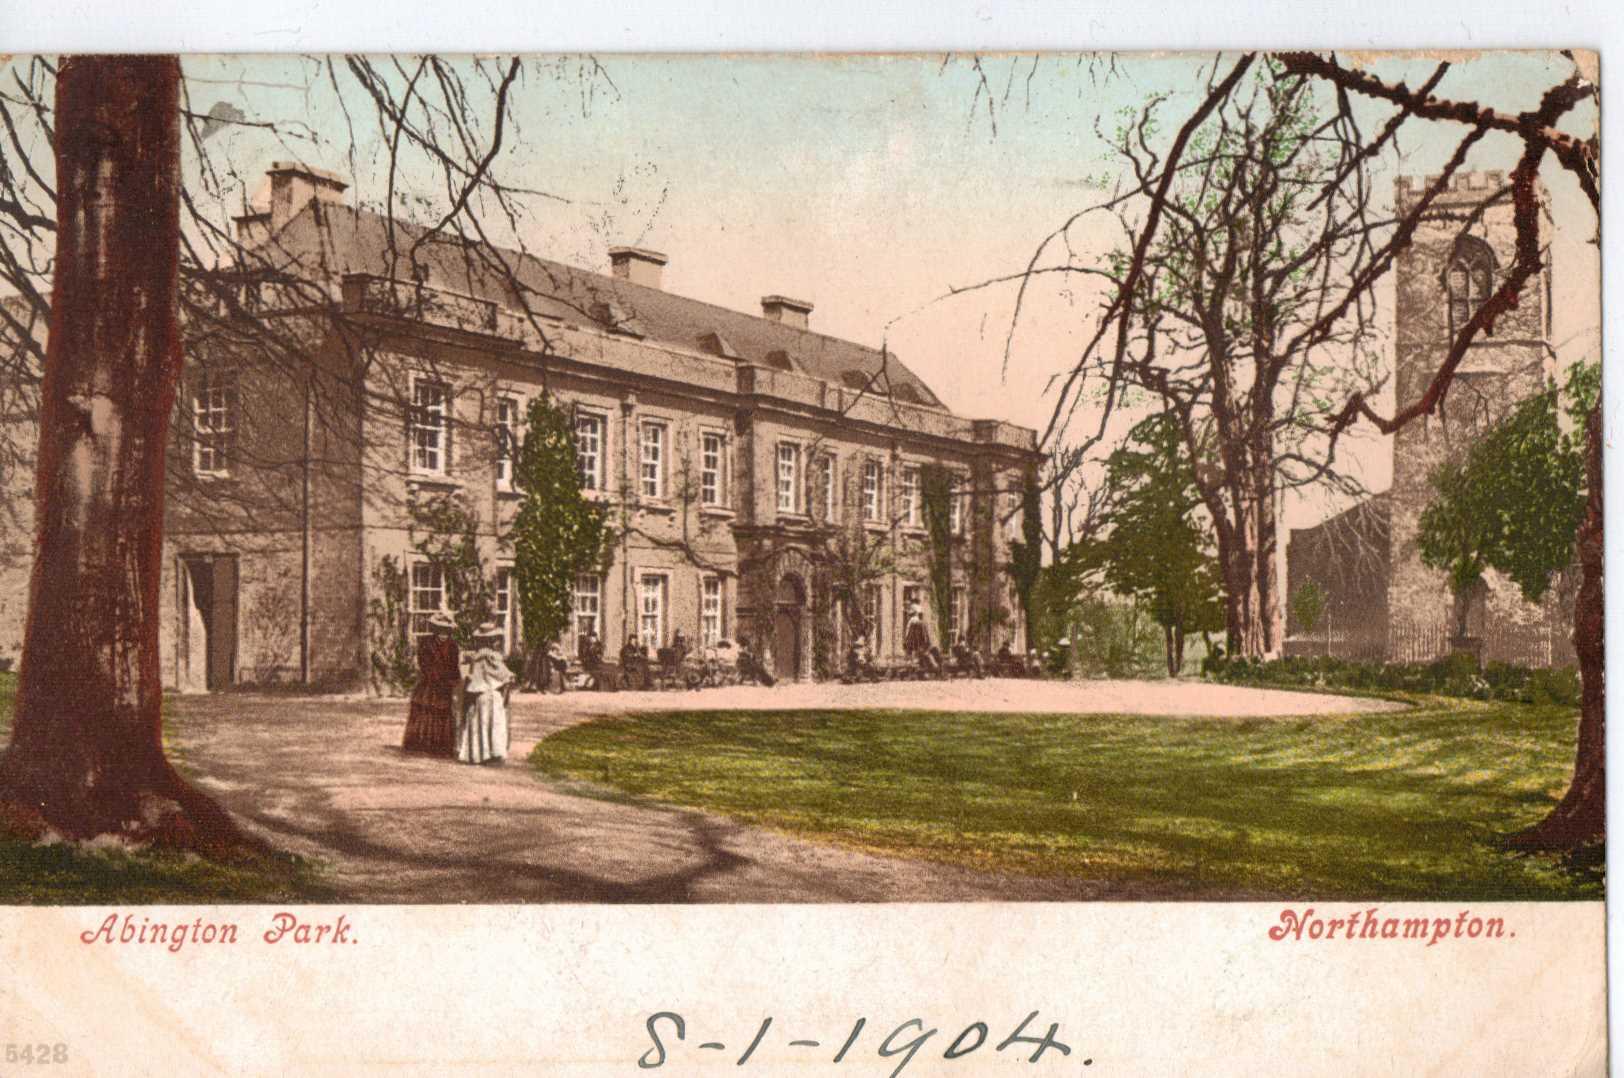 Abington Park in its heyday